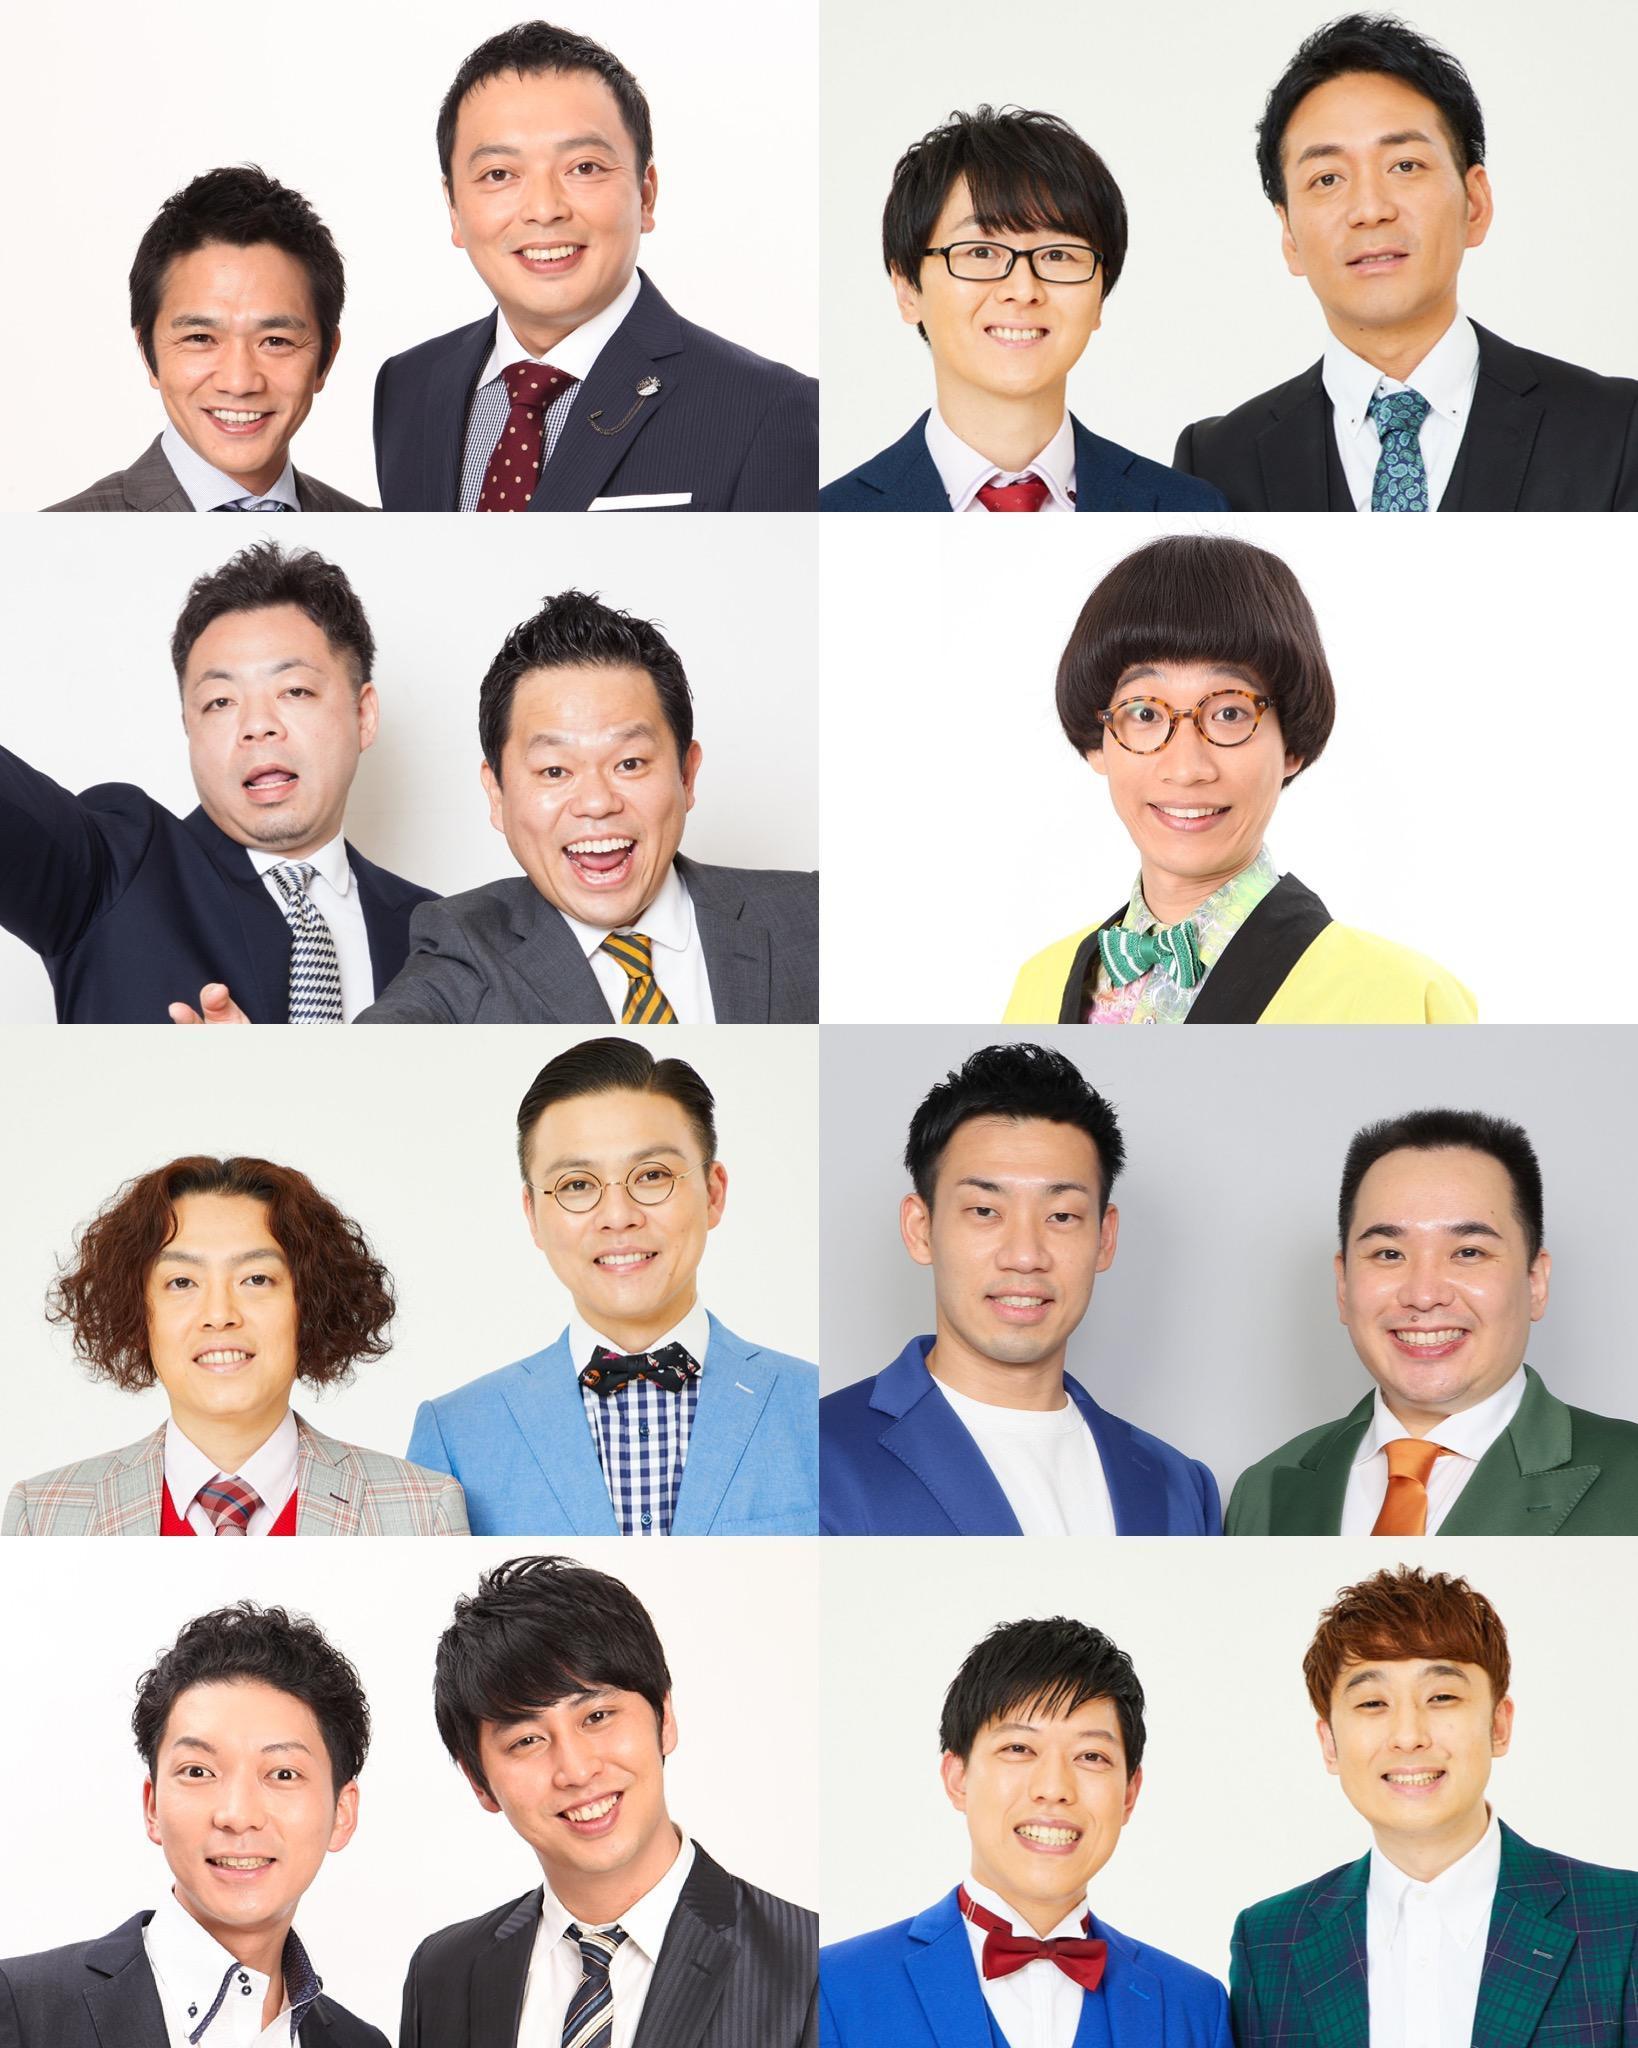 http://www.syumatsu.jp/20210416165253-1b497a6841fd2b8aab4ebd9cc2405da2cd358166.jpg